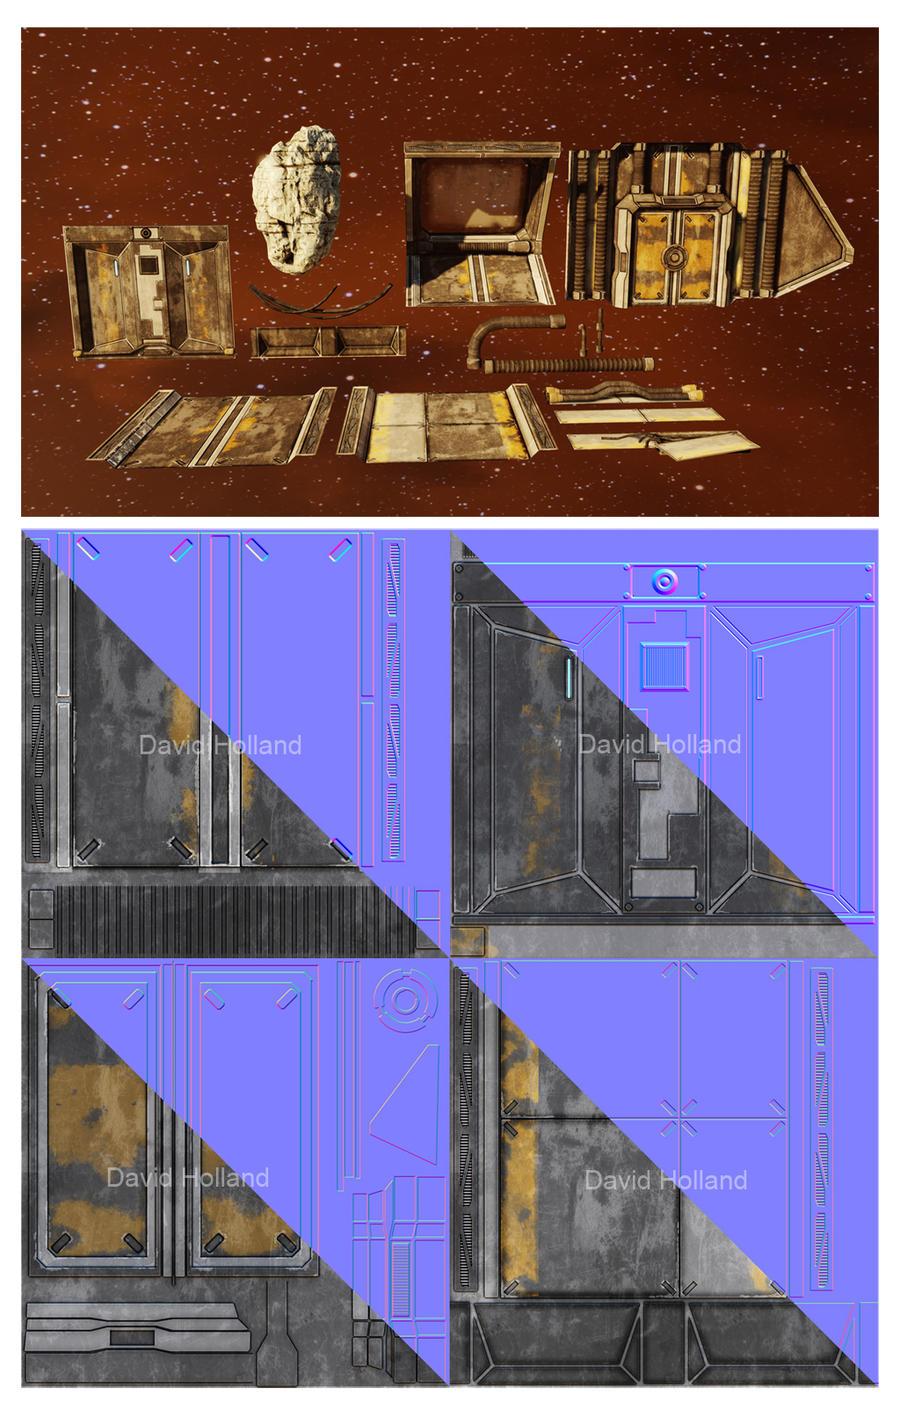 Generic Sci-Fi Hallway Assets by David-Holland